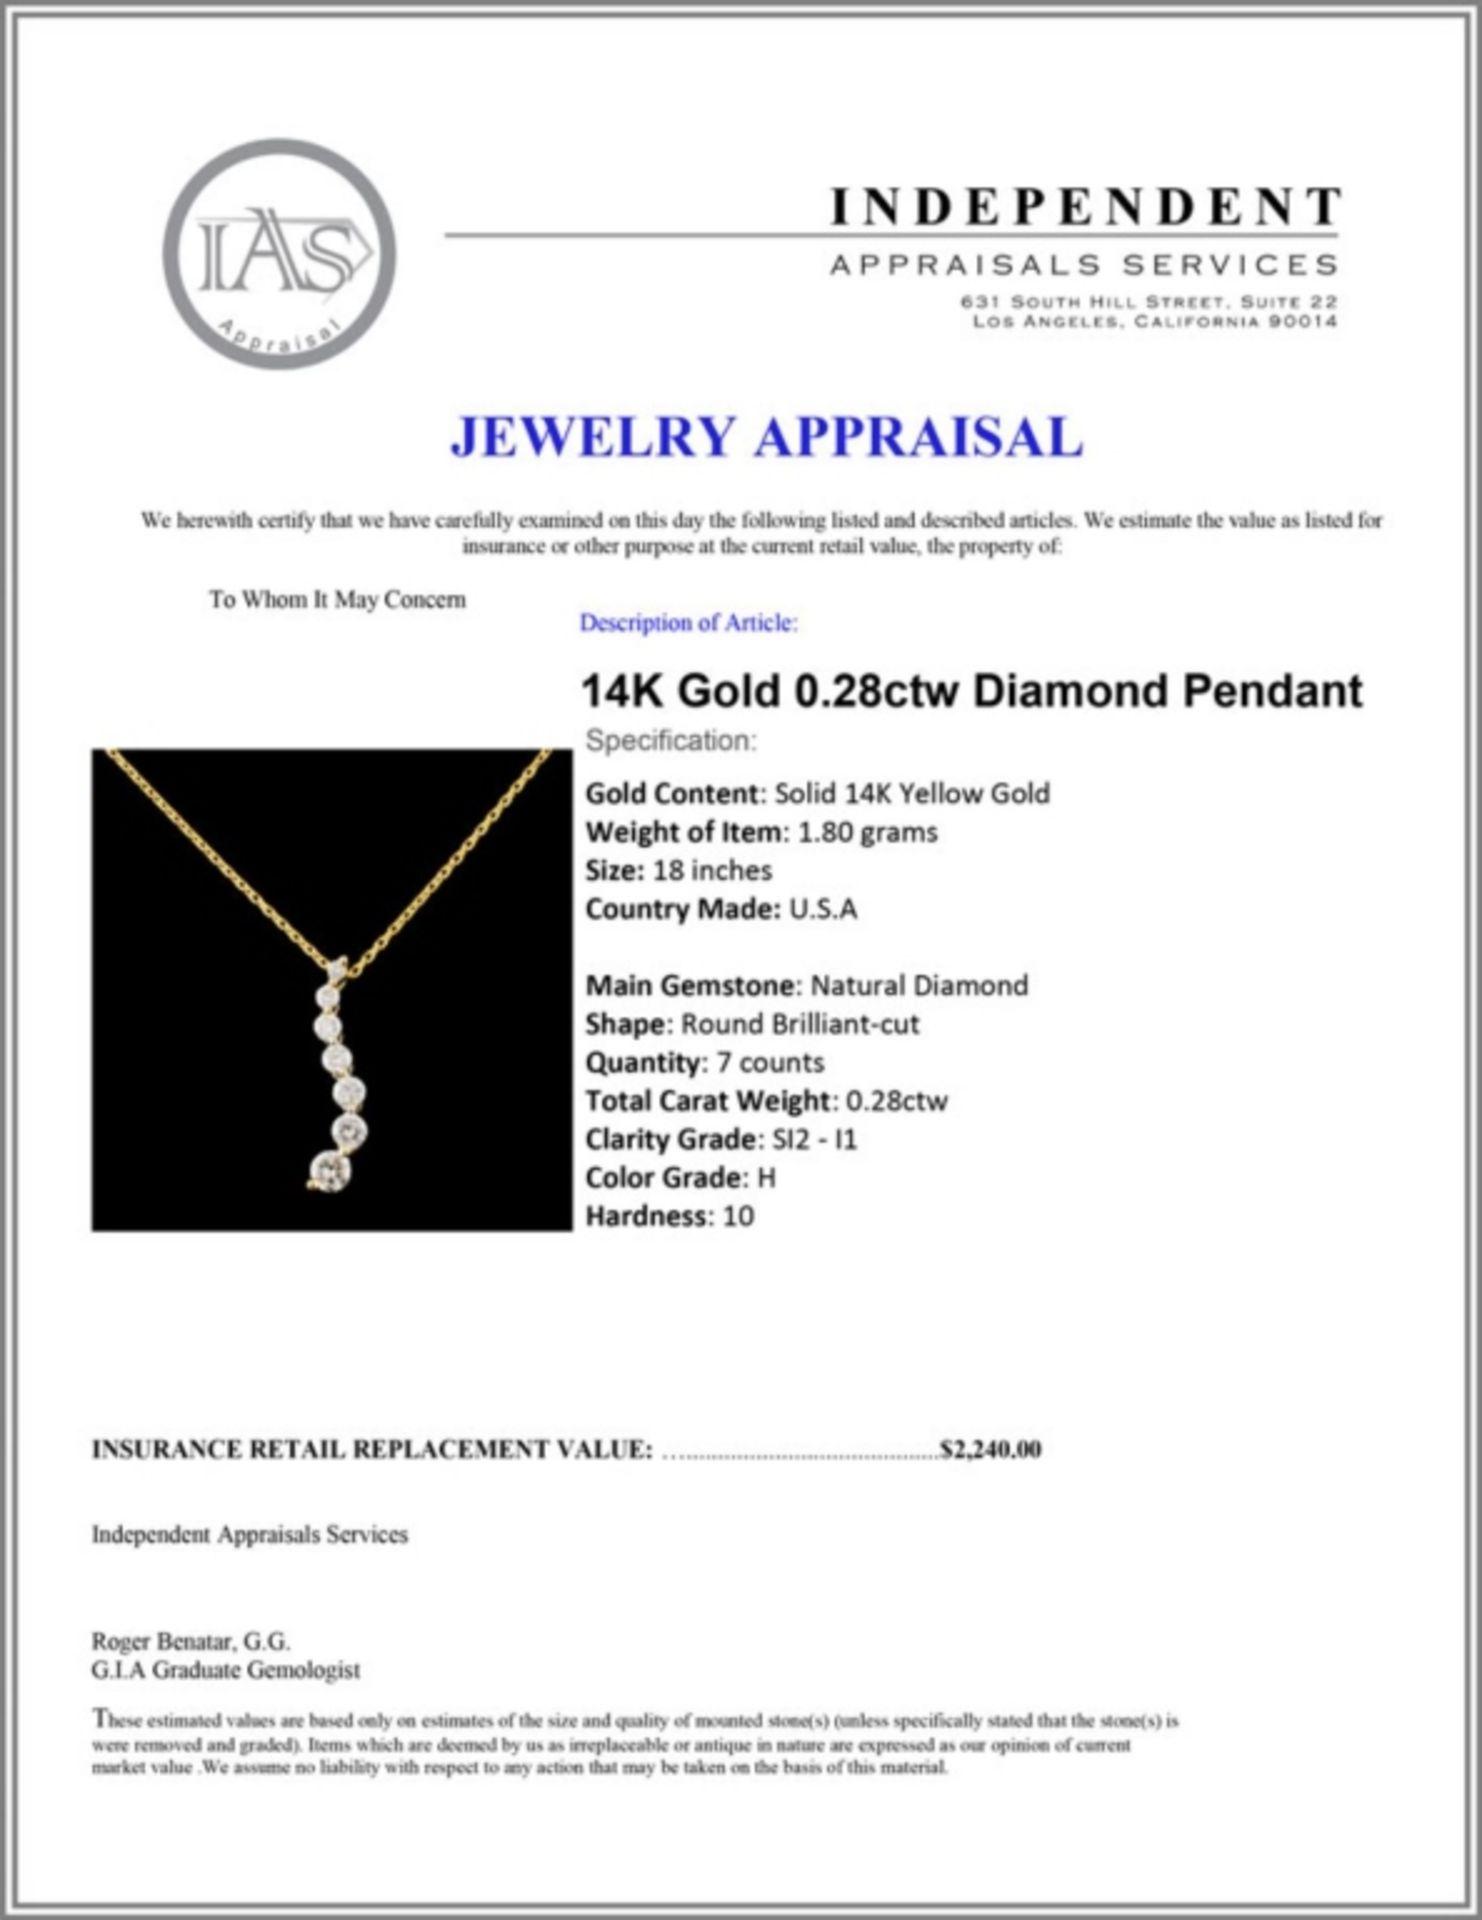 14K Gold 0.28ctw Diamond Pendant - Image 4 of 4